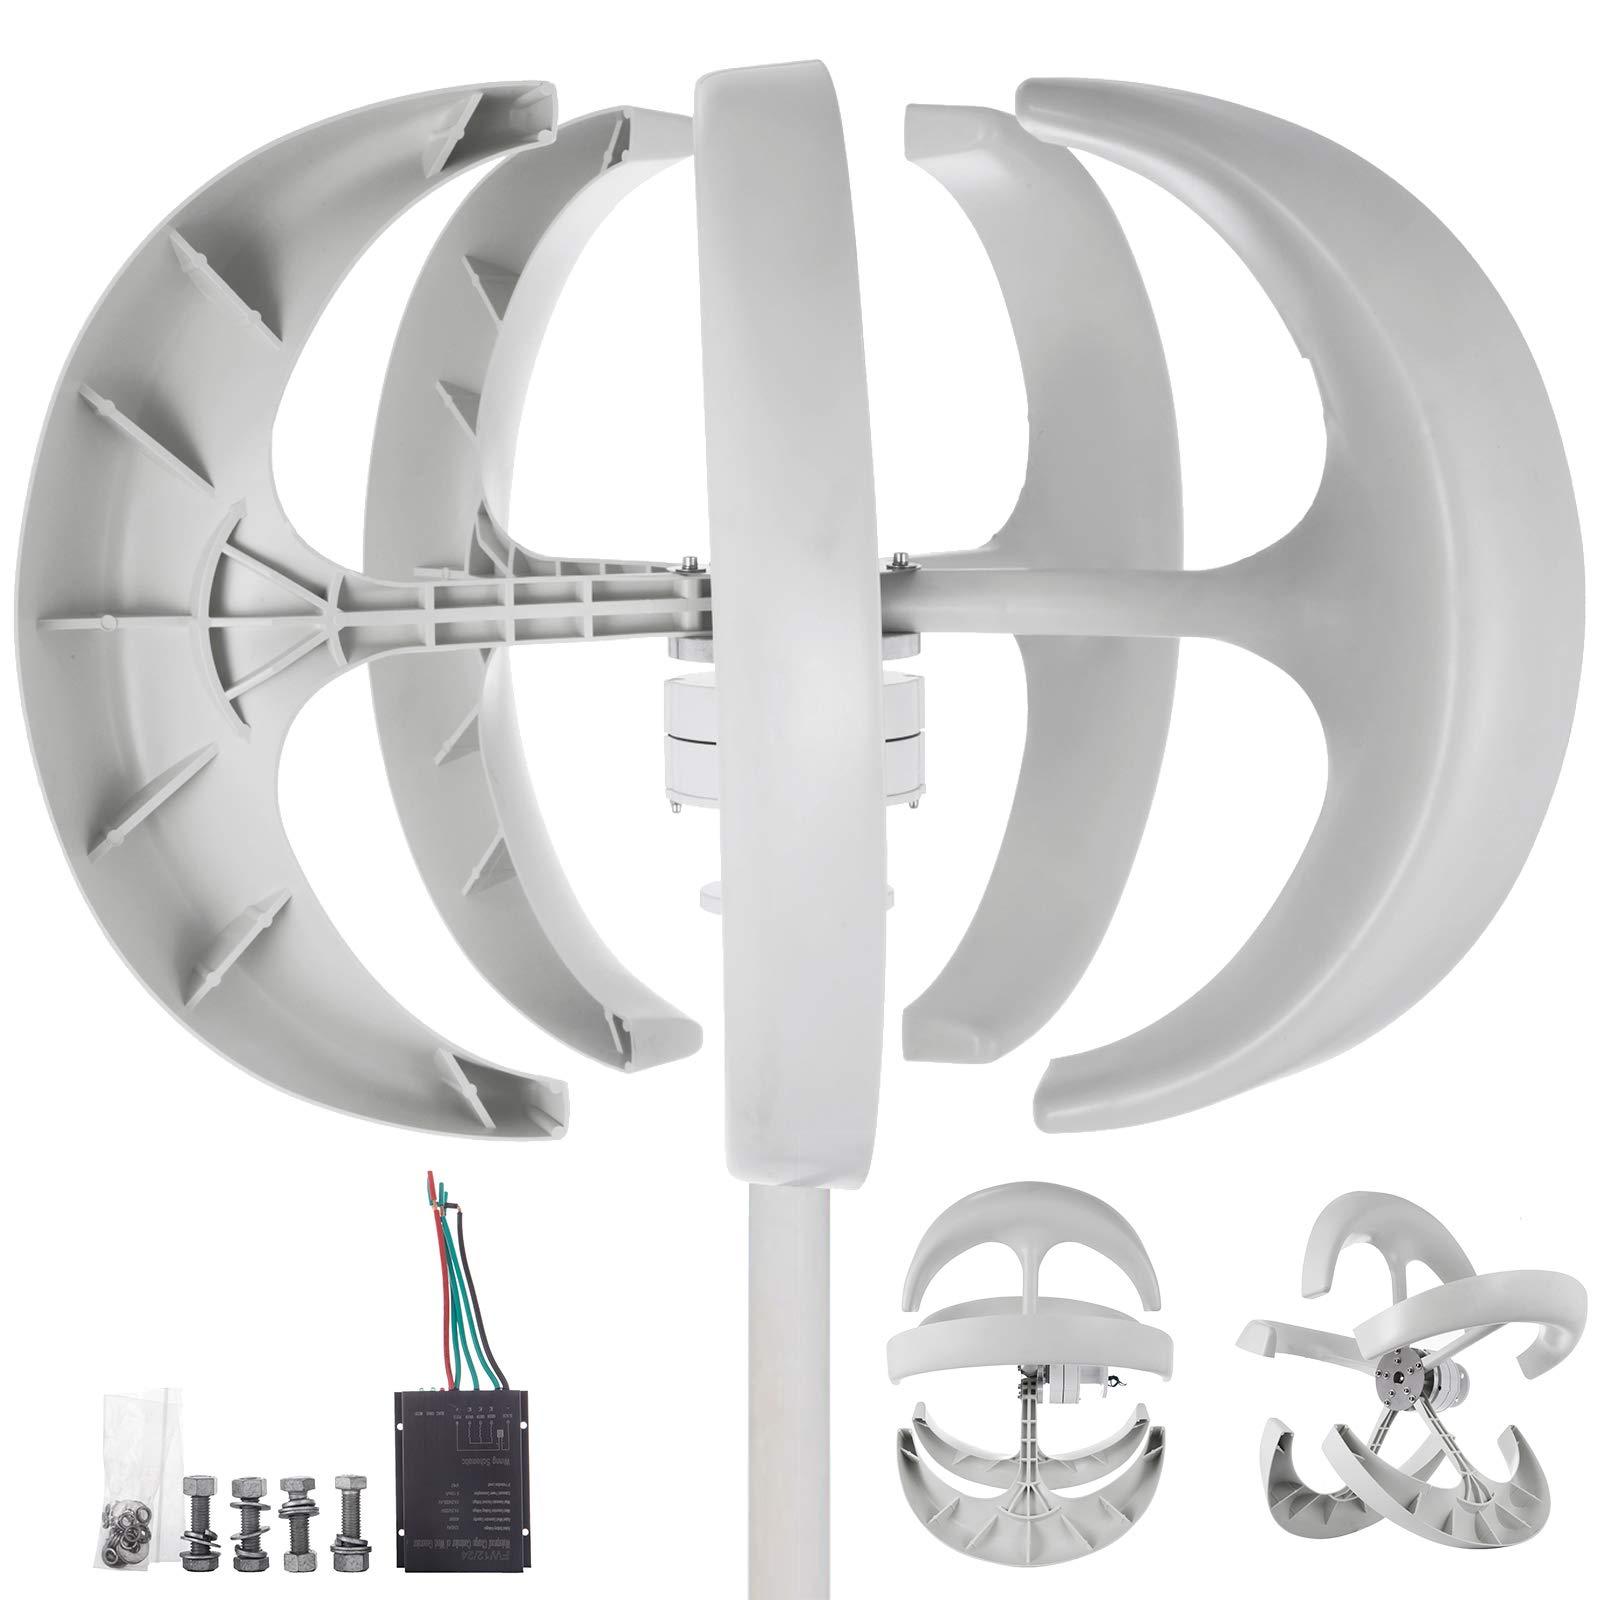 Happybuy Wind Turbine 400W 24V Wind Turbine Generator White Lantern Vertical Wind Generator 5 Leaves Wind Turbine Kit with Controller No Pole (400W 24V, White)